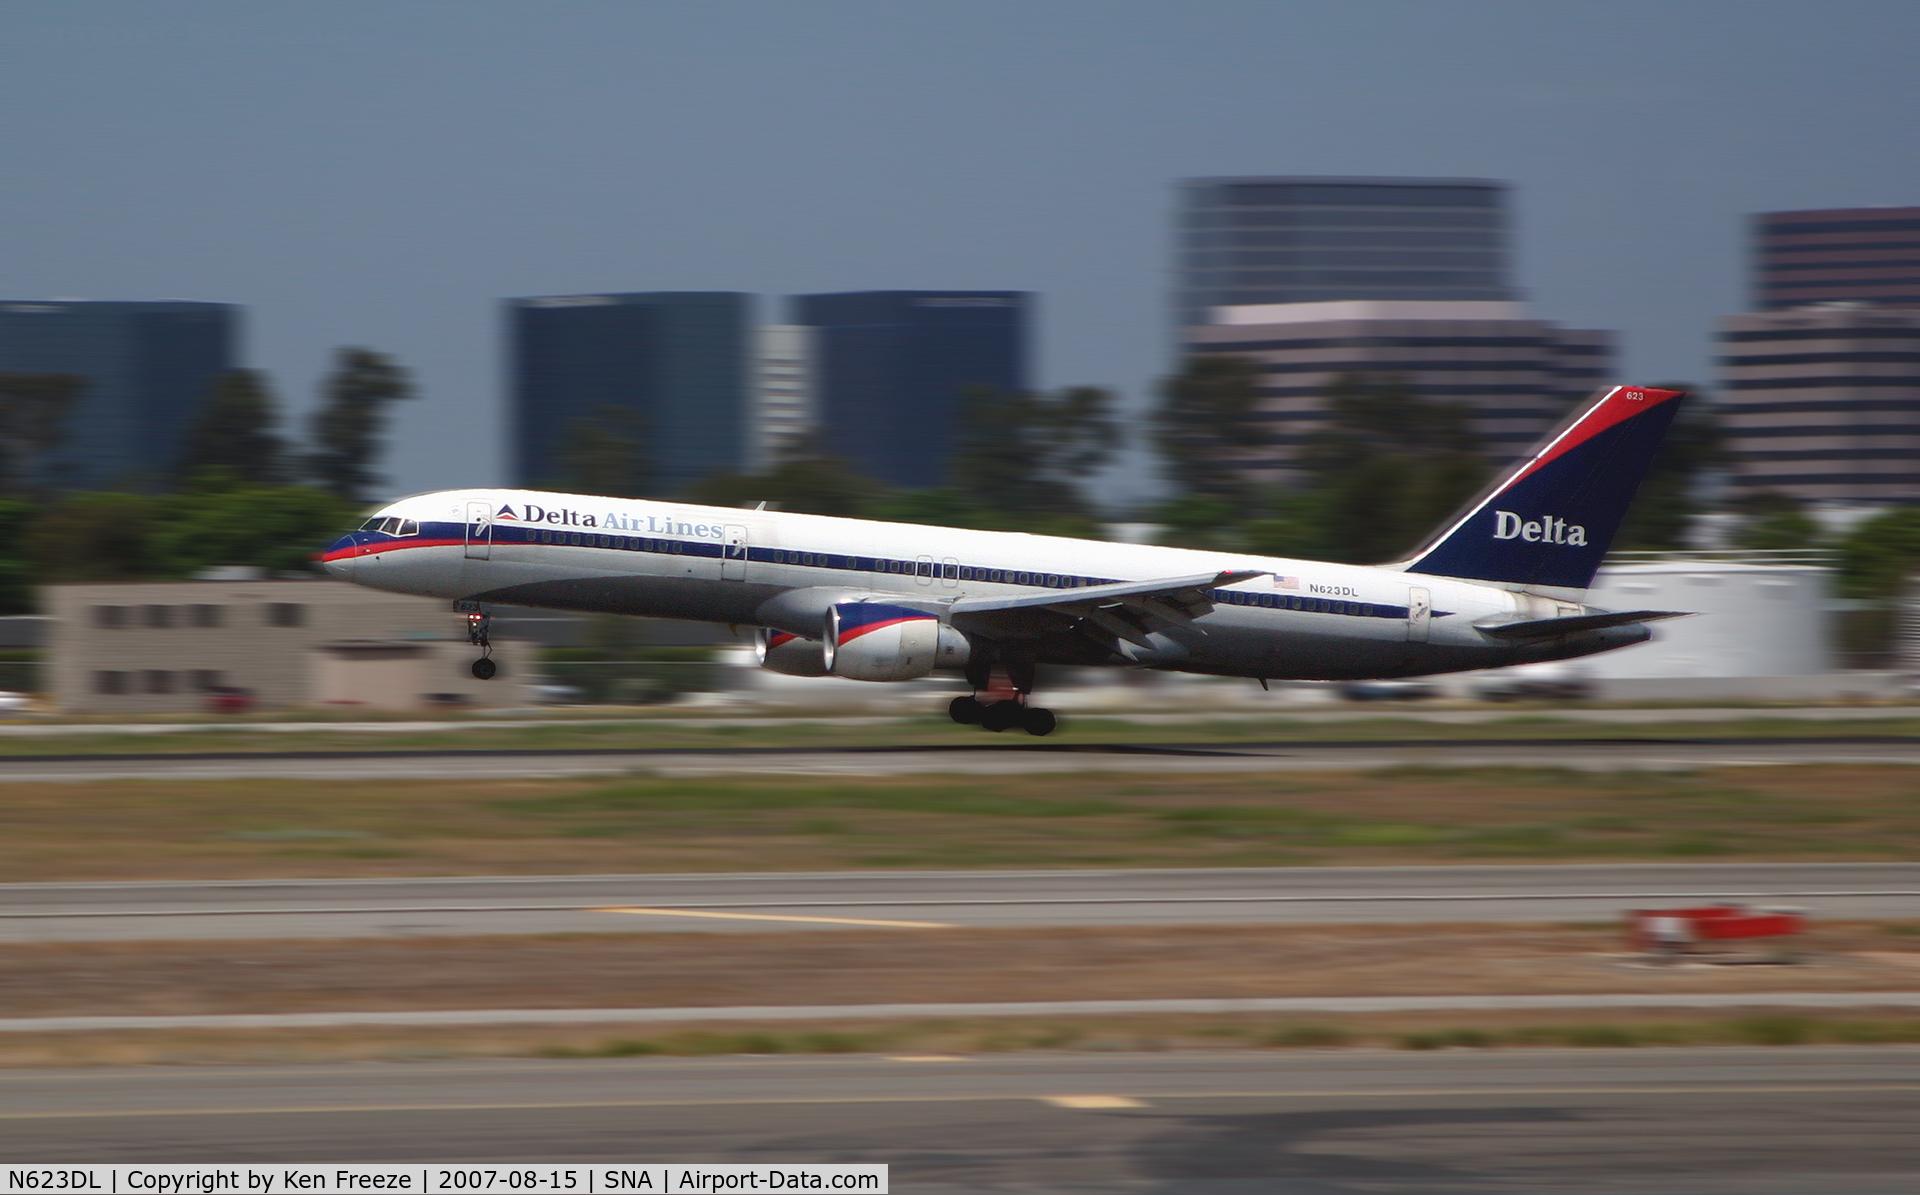 N623DL, 1987 Boeing 757-232 C/N 22913, 757 landing at John Wayne Airport